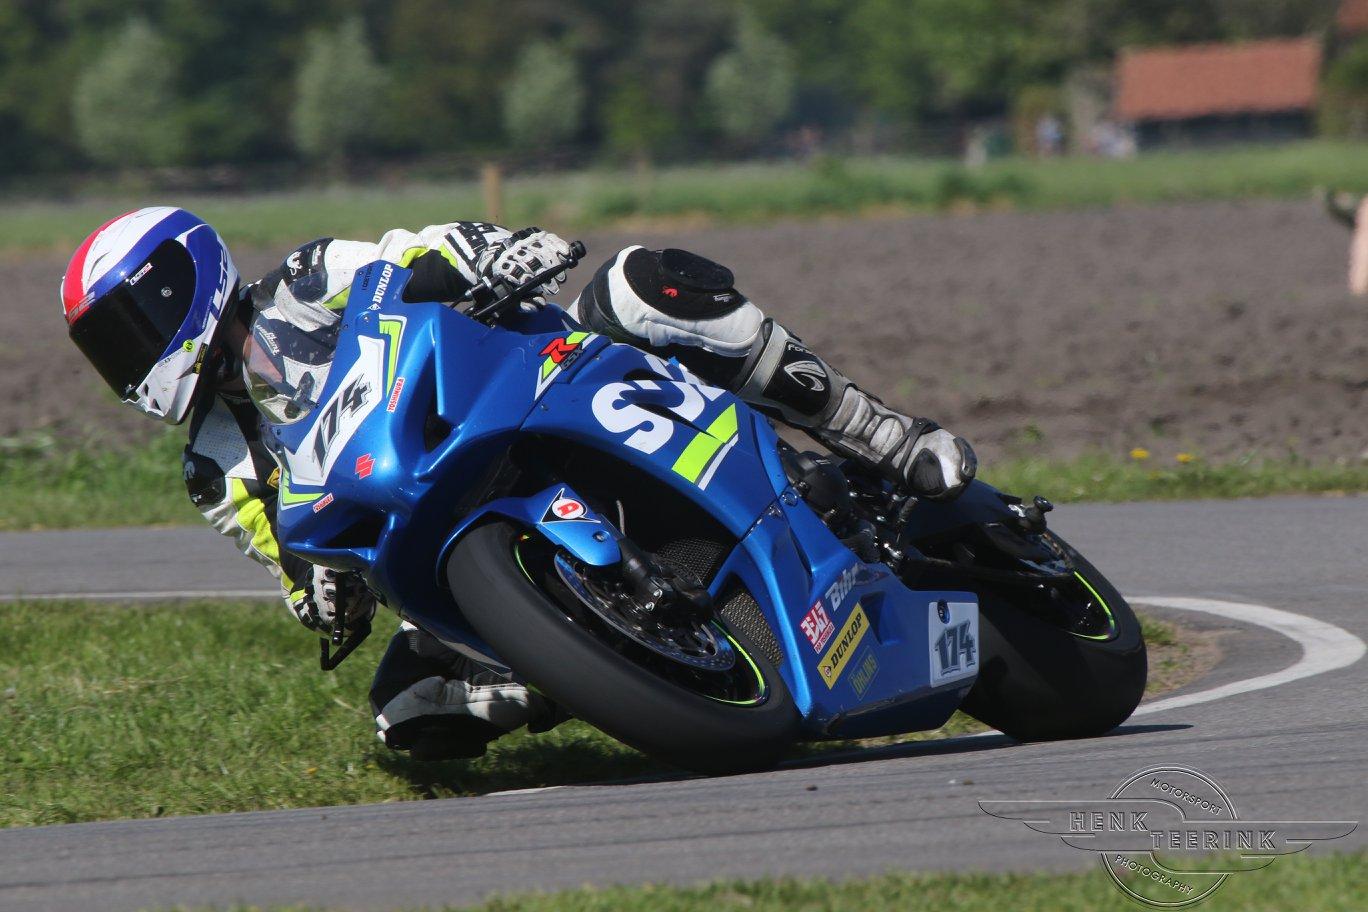 IRRC Supersport Front Runner Goetschy Announces Manx GP Plans